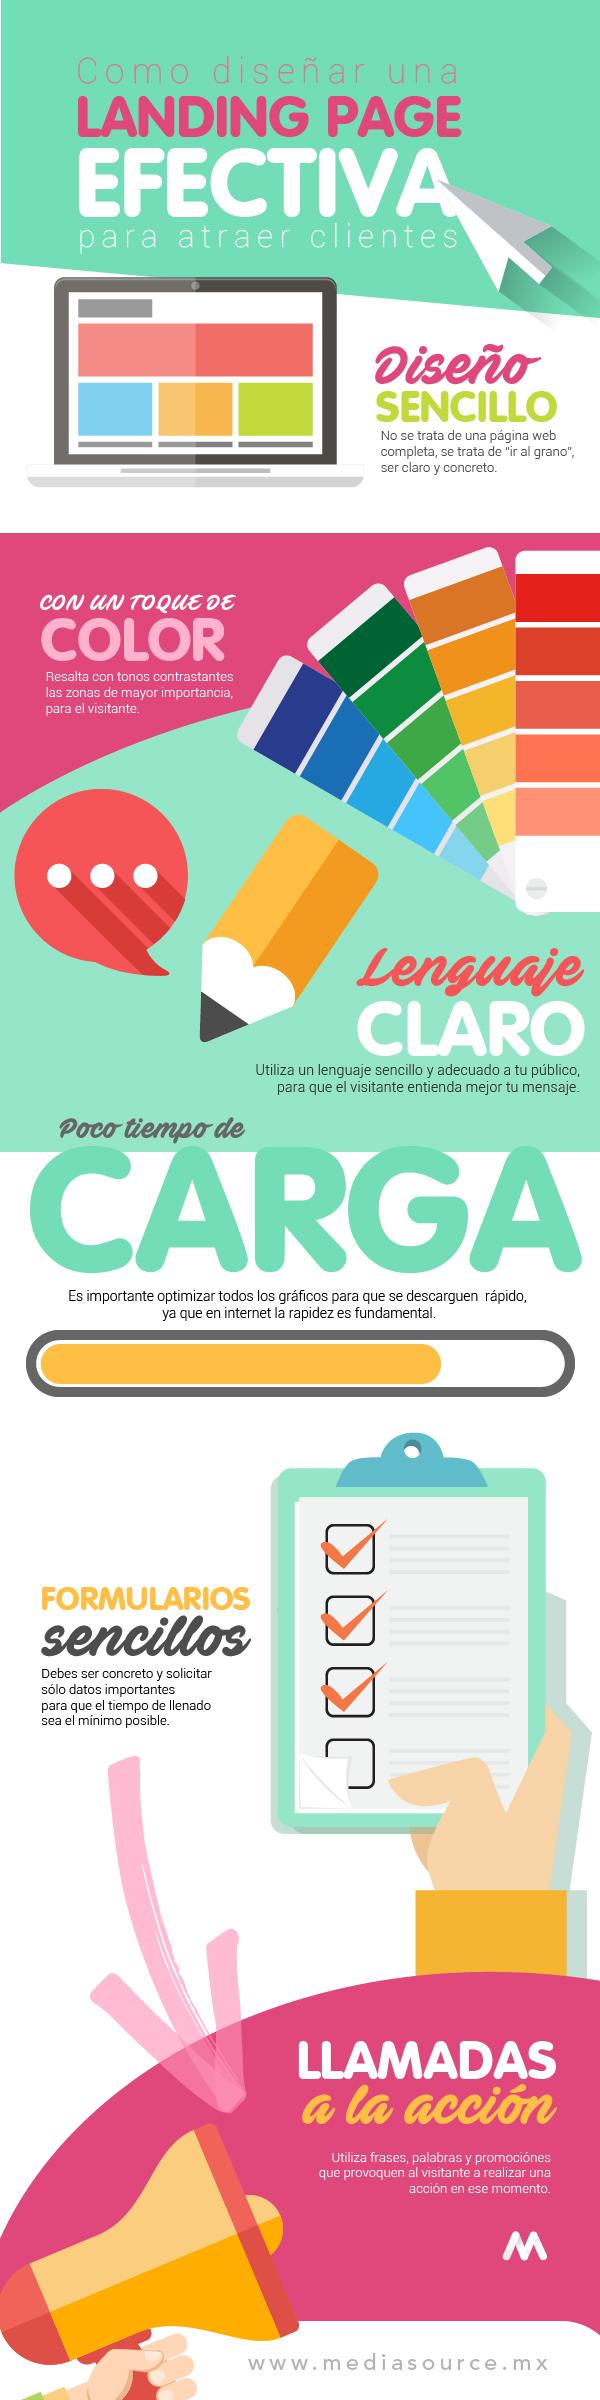 landing-page-efectiva-infografia